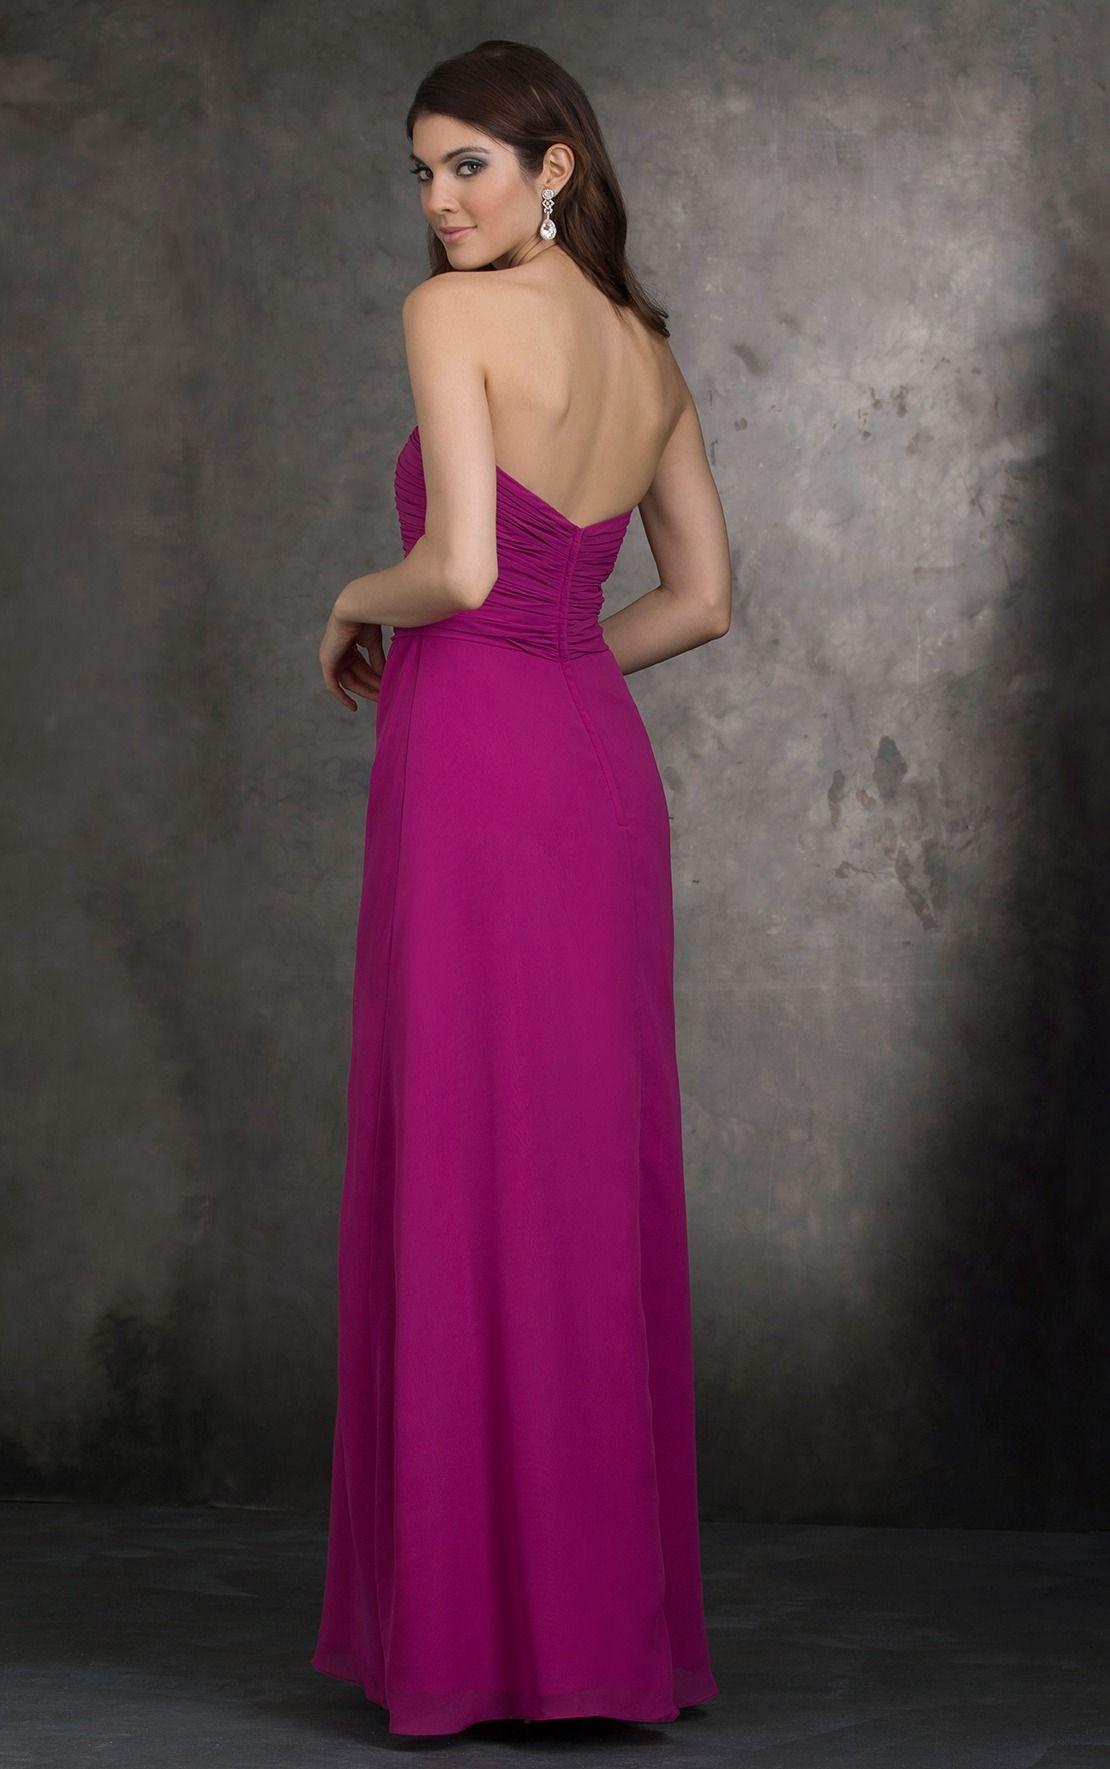 Strapless Ruched Long Fuchsia Chiffon Bridesmaid Dress with Sash ...